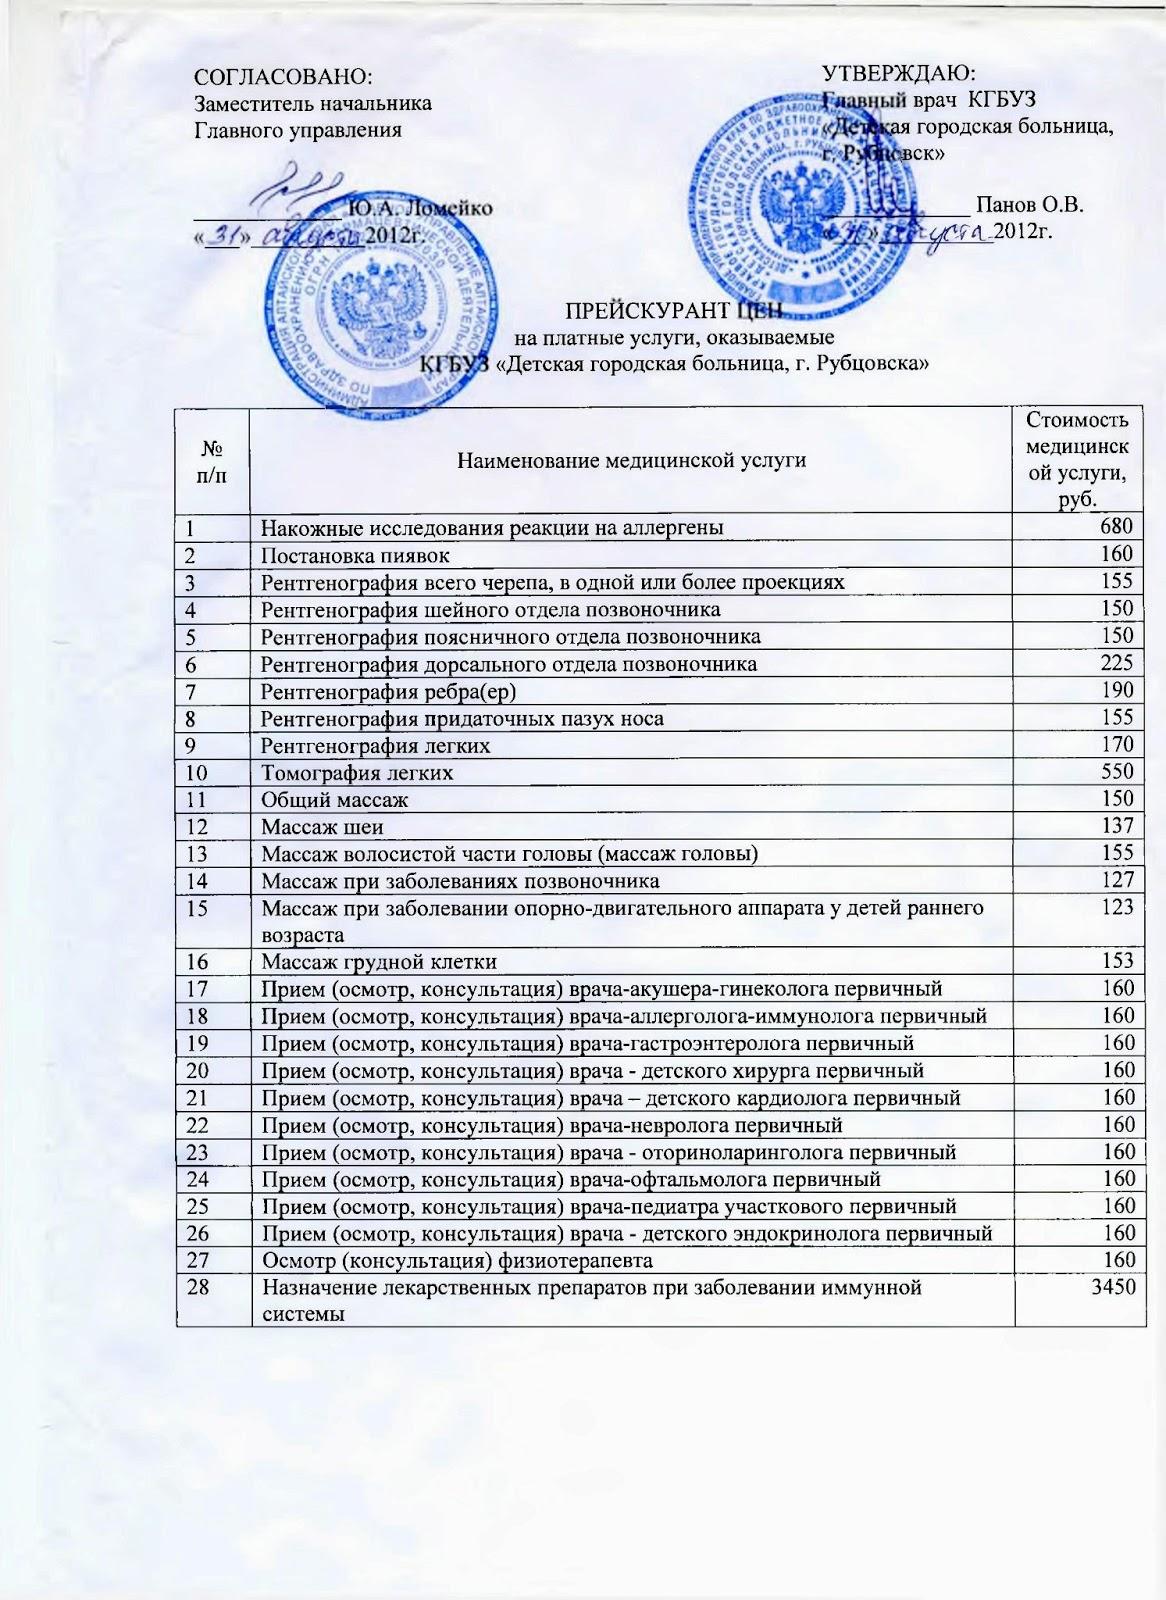 Работа лор врач краснодарский край